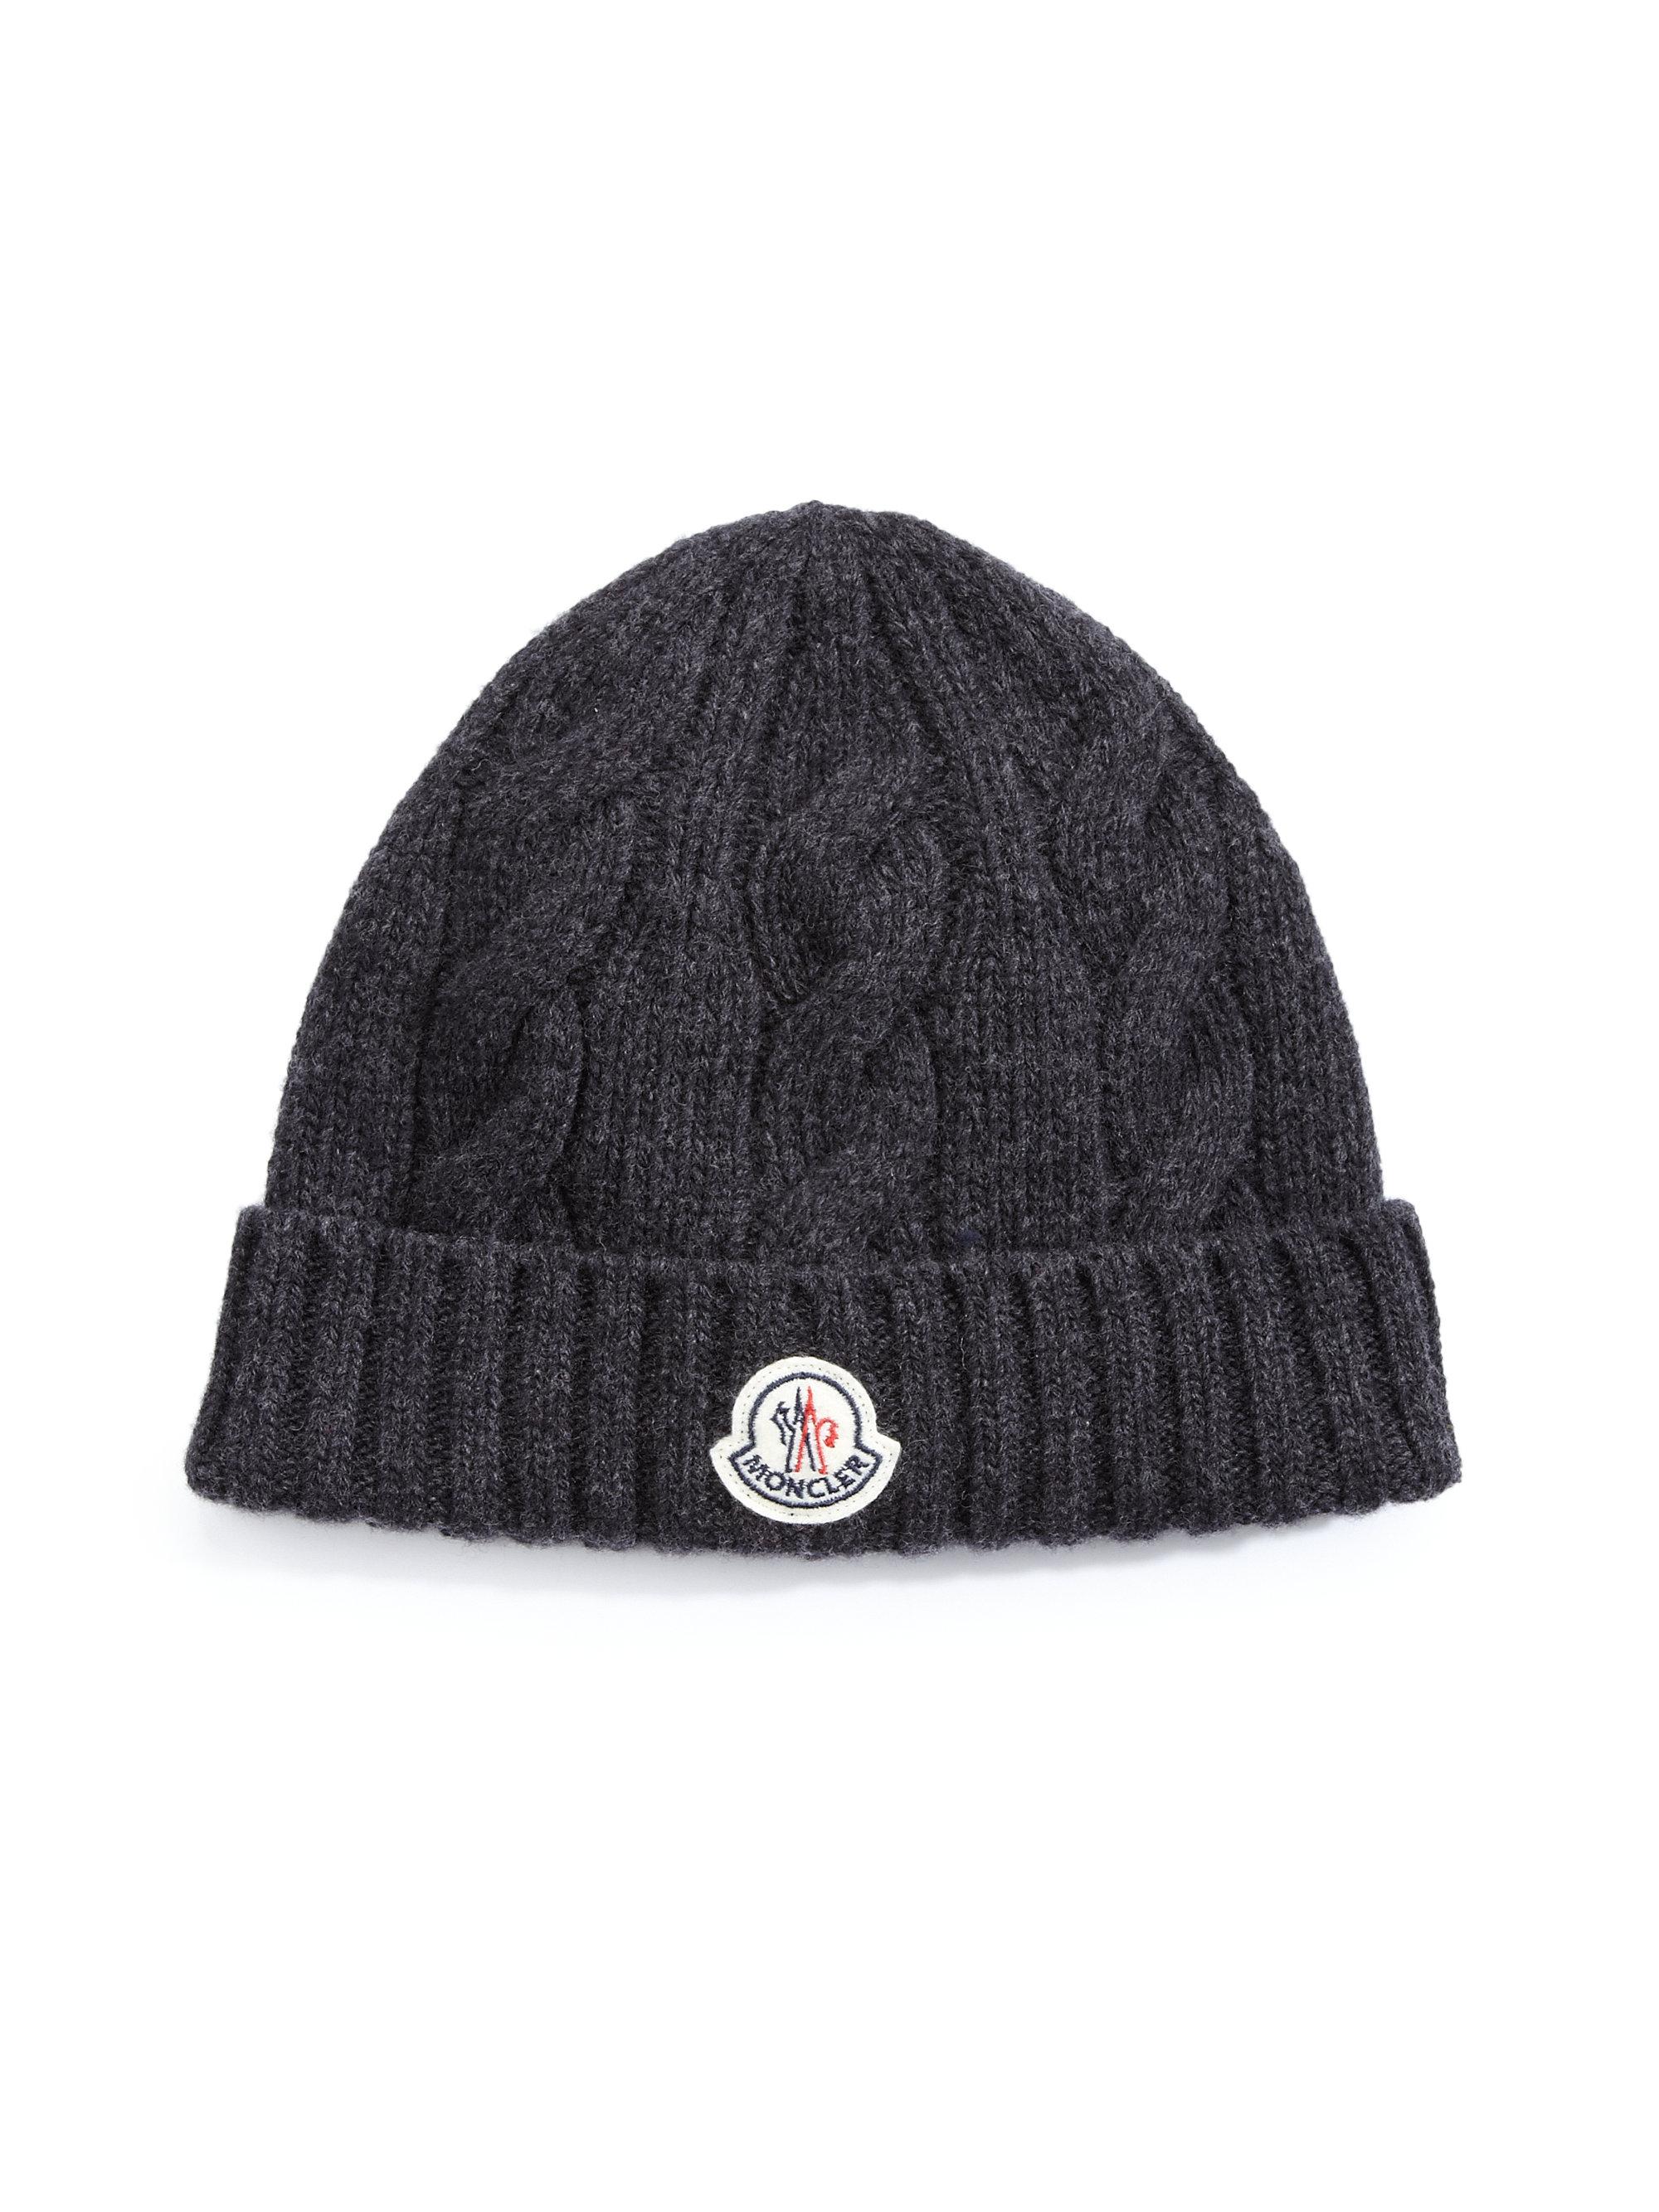 cb1c9fcf4 Lyst - Moncler Cable-knit Cap in Black for Men